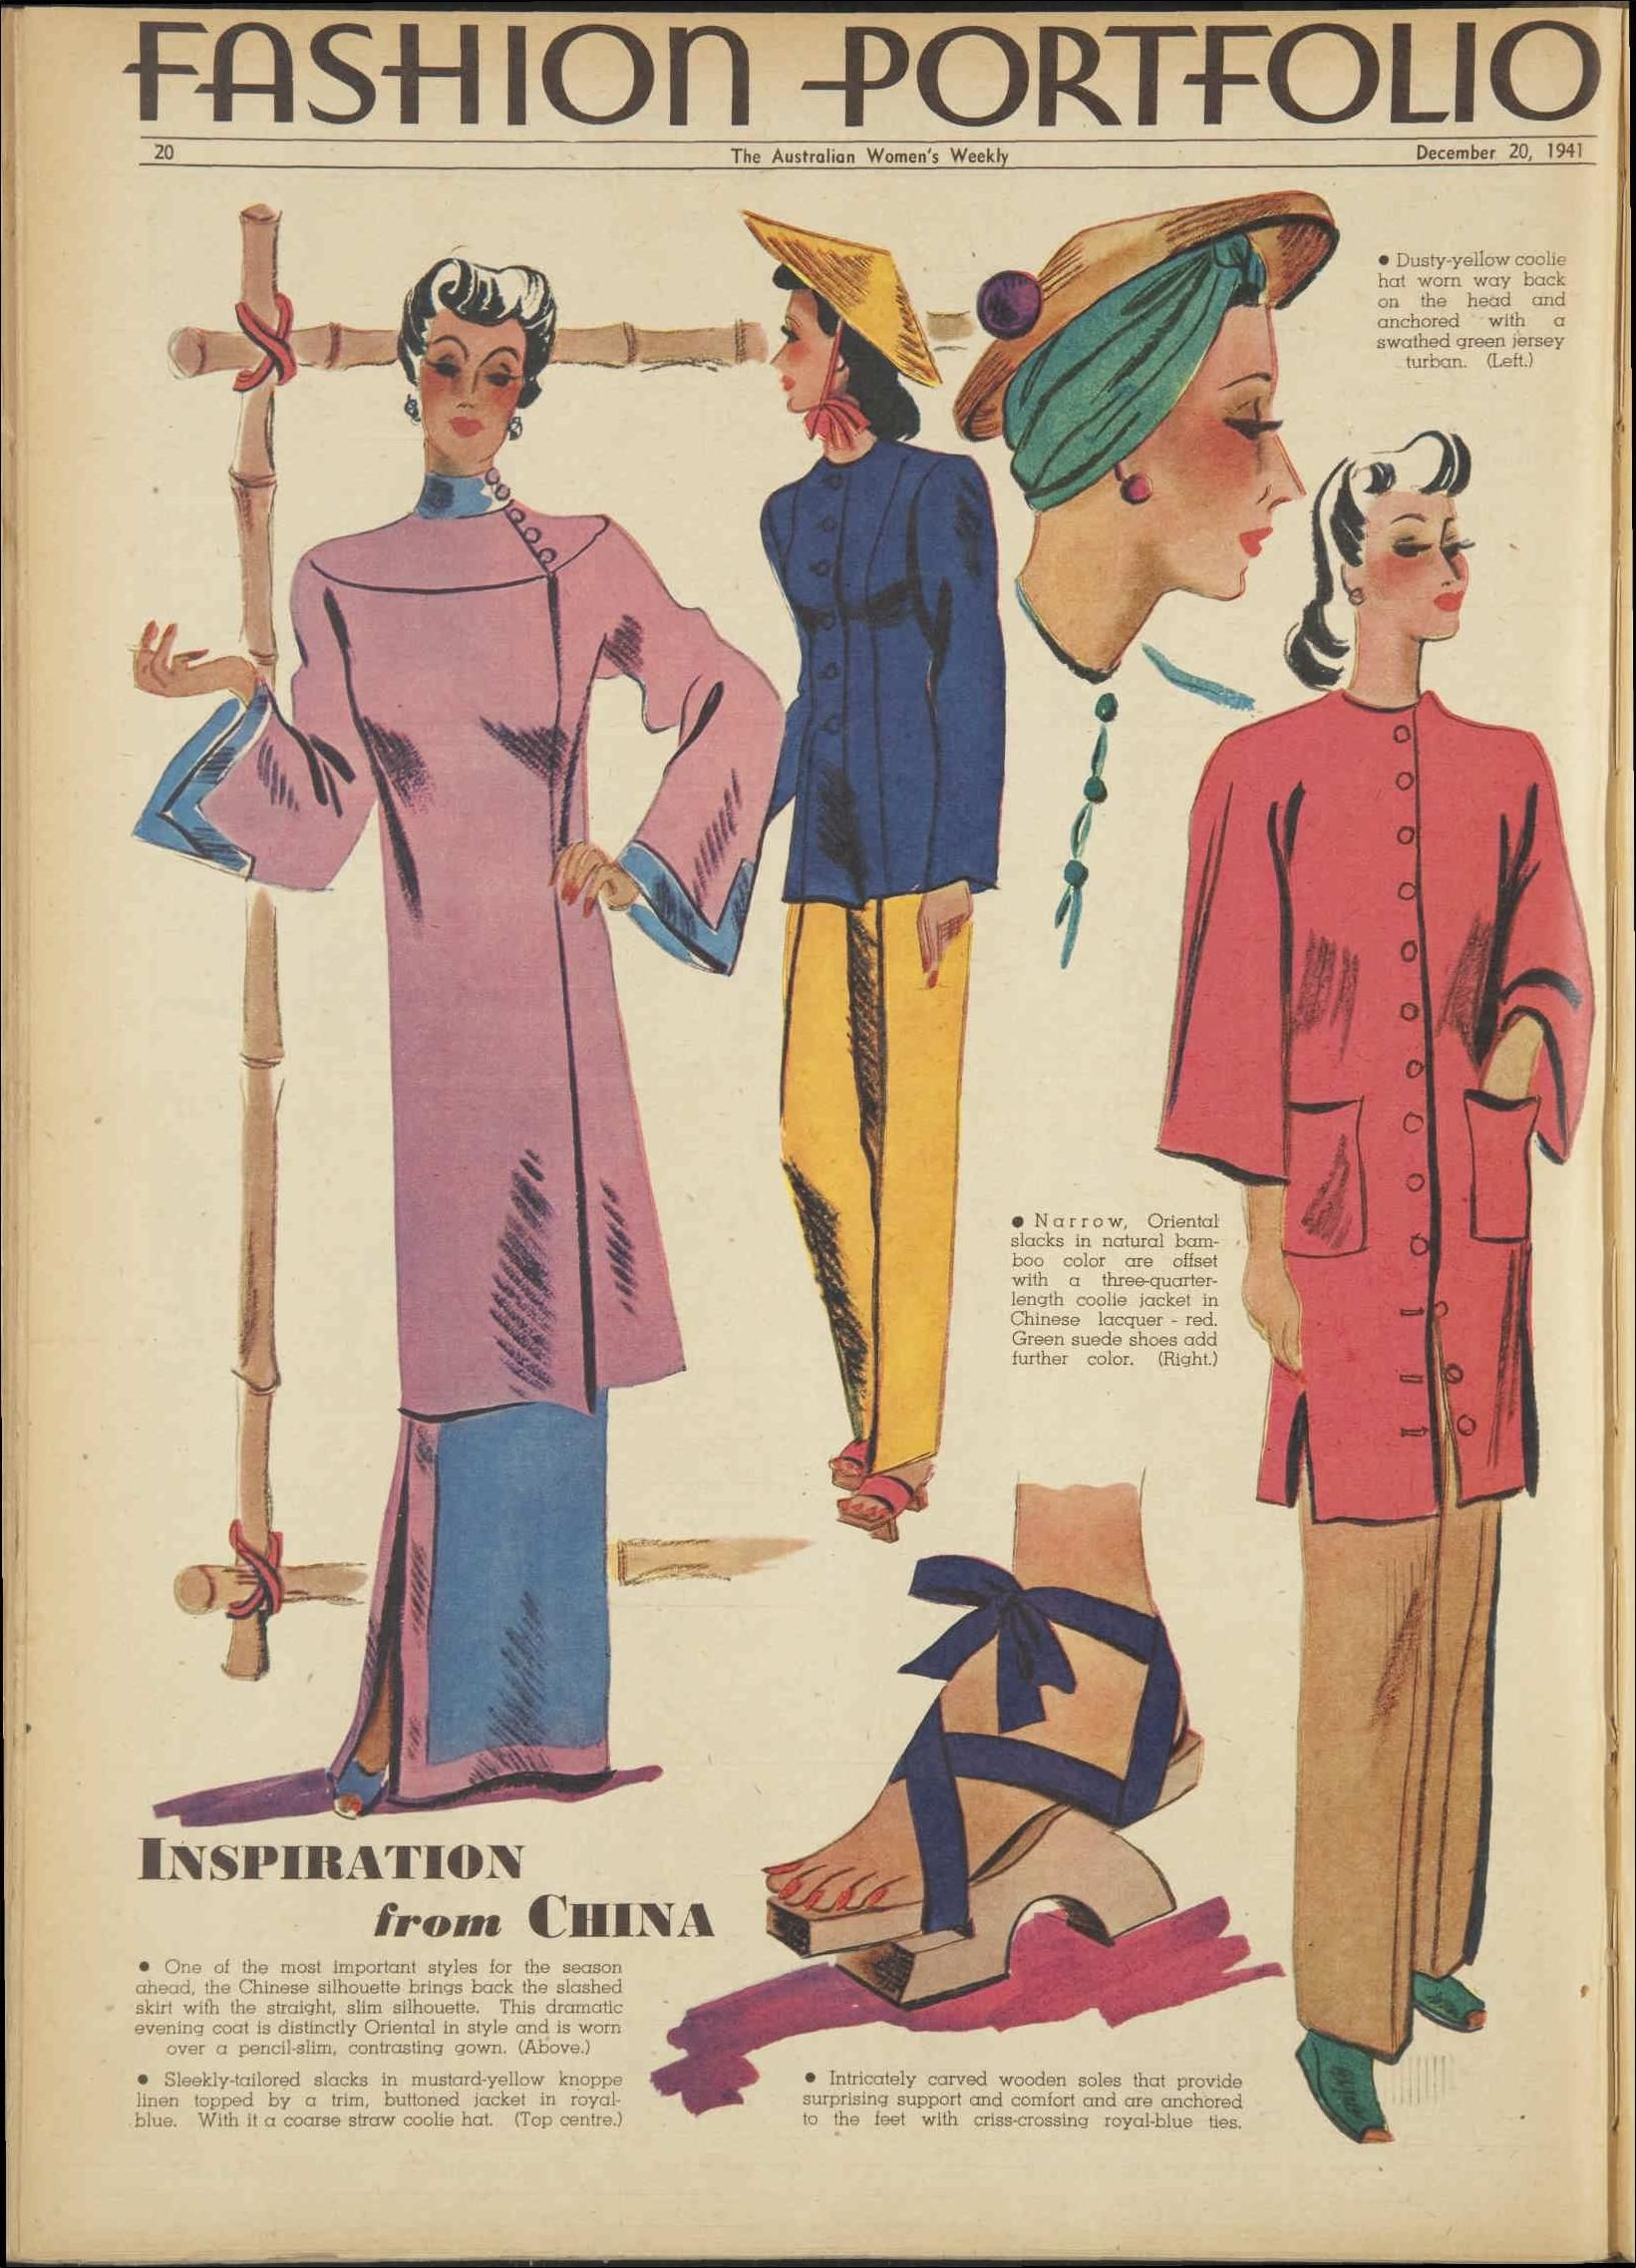 188e09ee0b ... Weekly 40s Asian looks vintage fashion style coat dress jacket pants  hat scarf shoes sandals wood pajamas qipao chongsam pants Chinese Singapore  looks